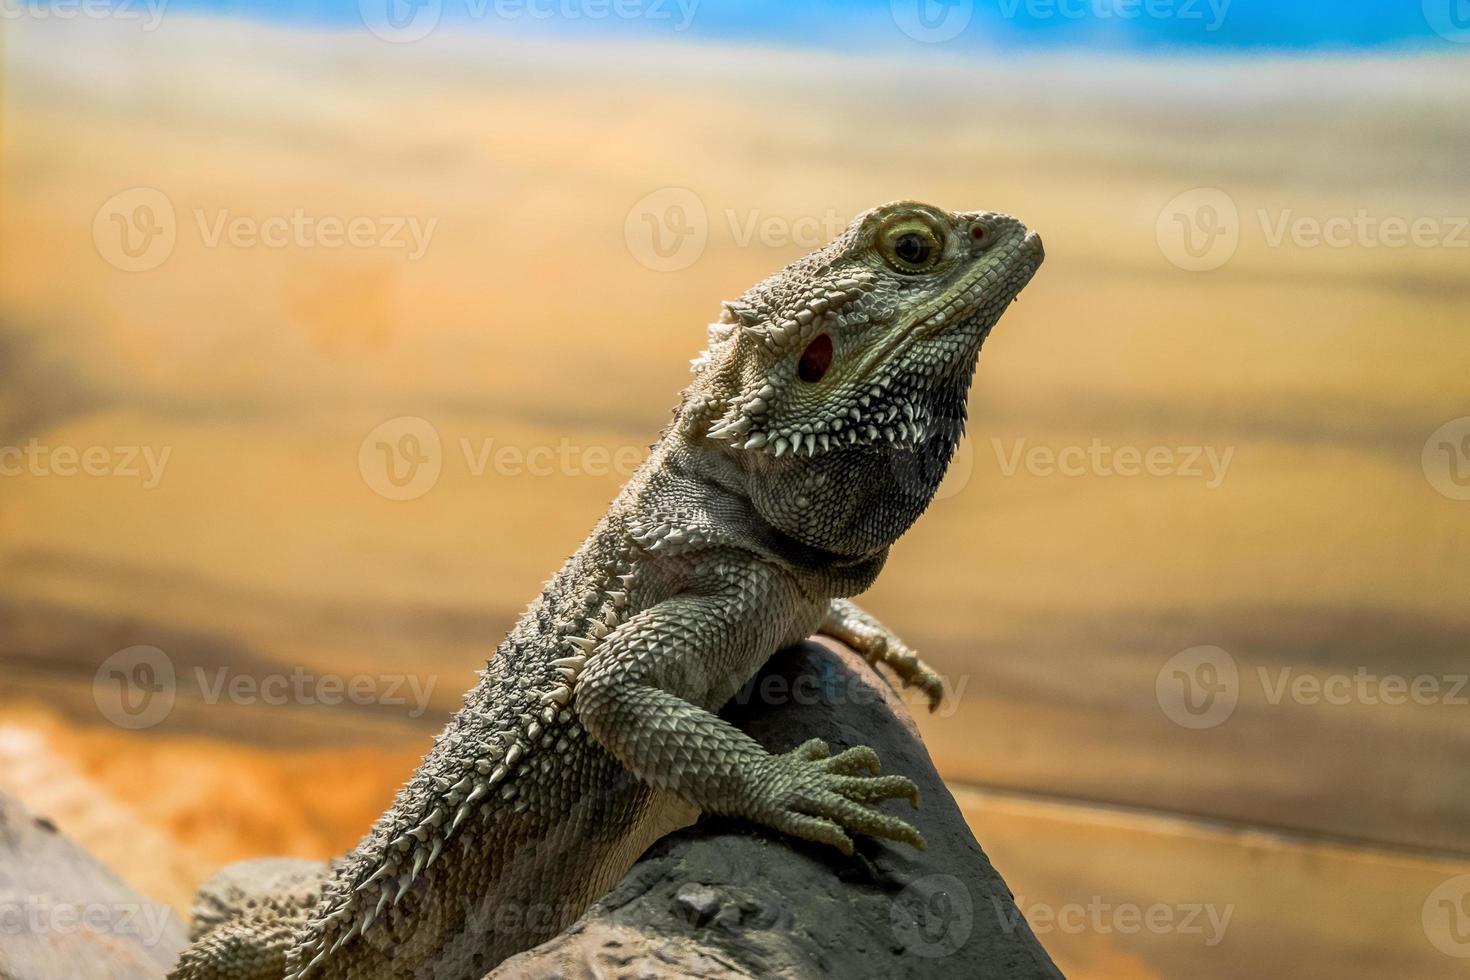 Bearded dragon on rock photo